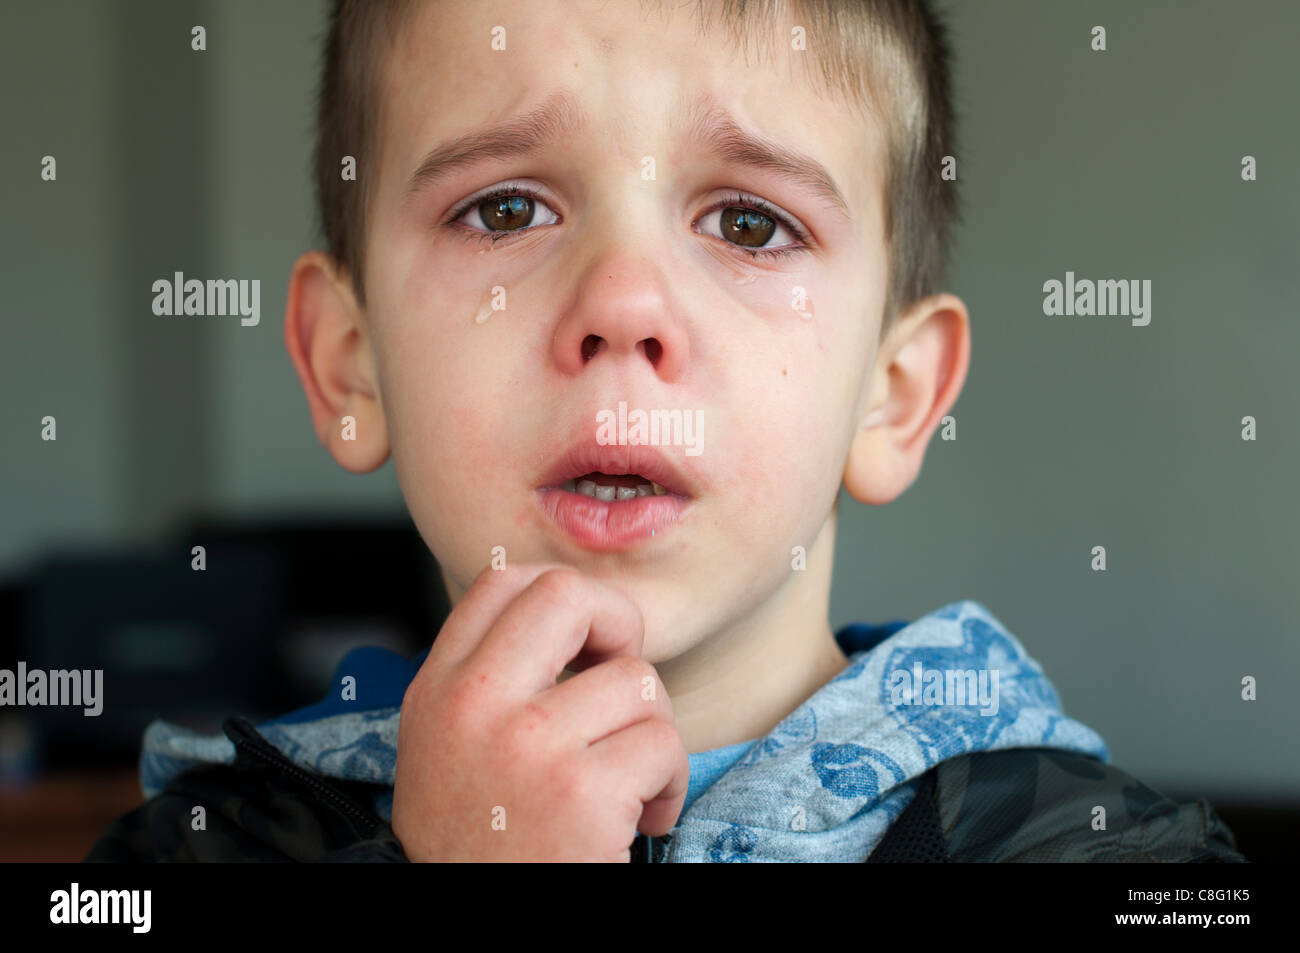 Sad child who is crying. Close up - Stock Image